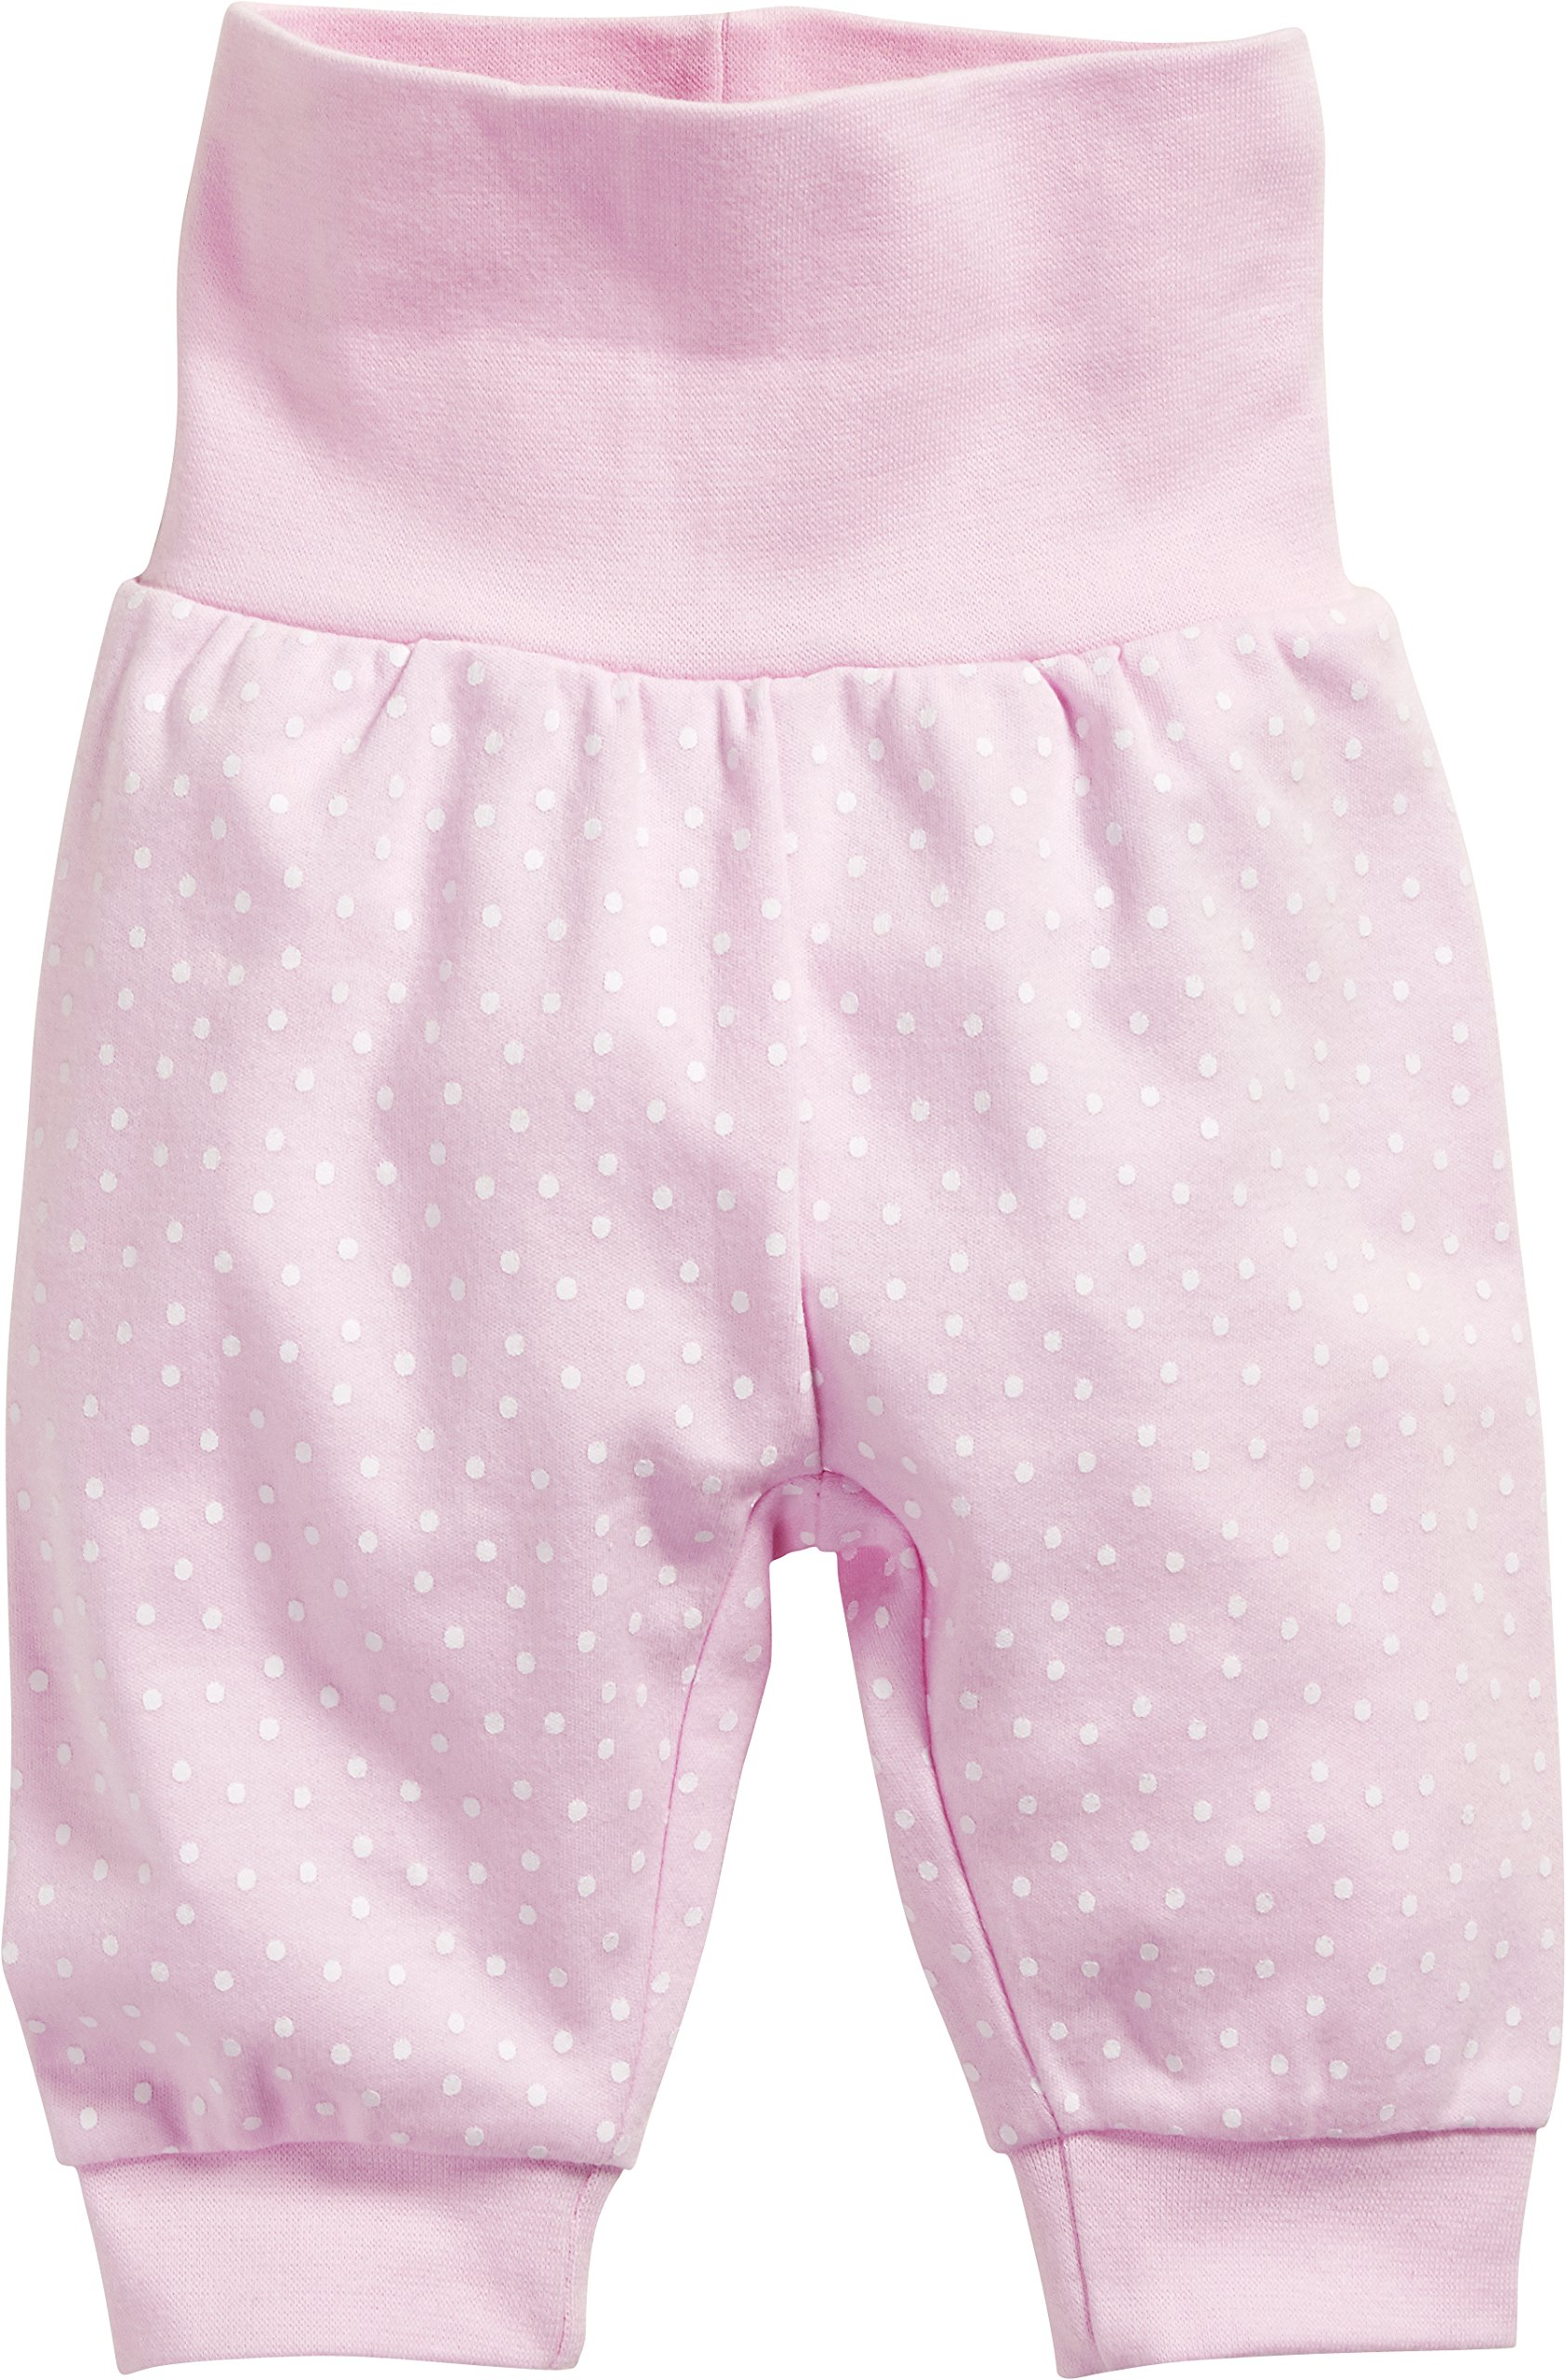 Schnizler Baby-Pumphose Interlock Punkte Pantalones de Deporte para Bebés 2